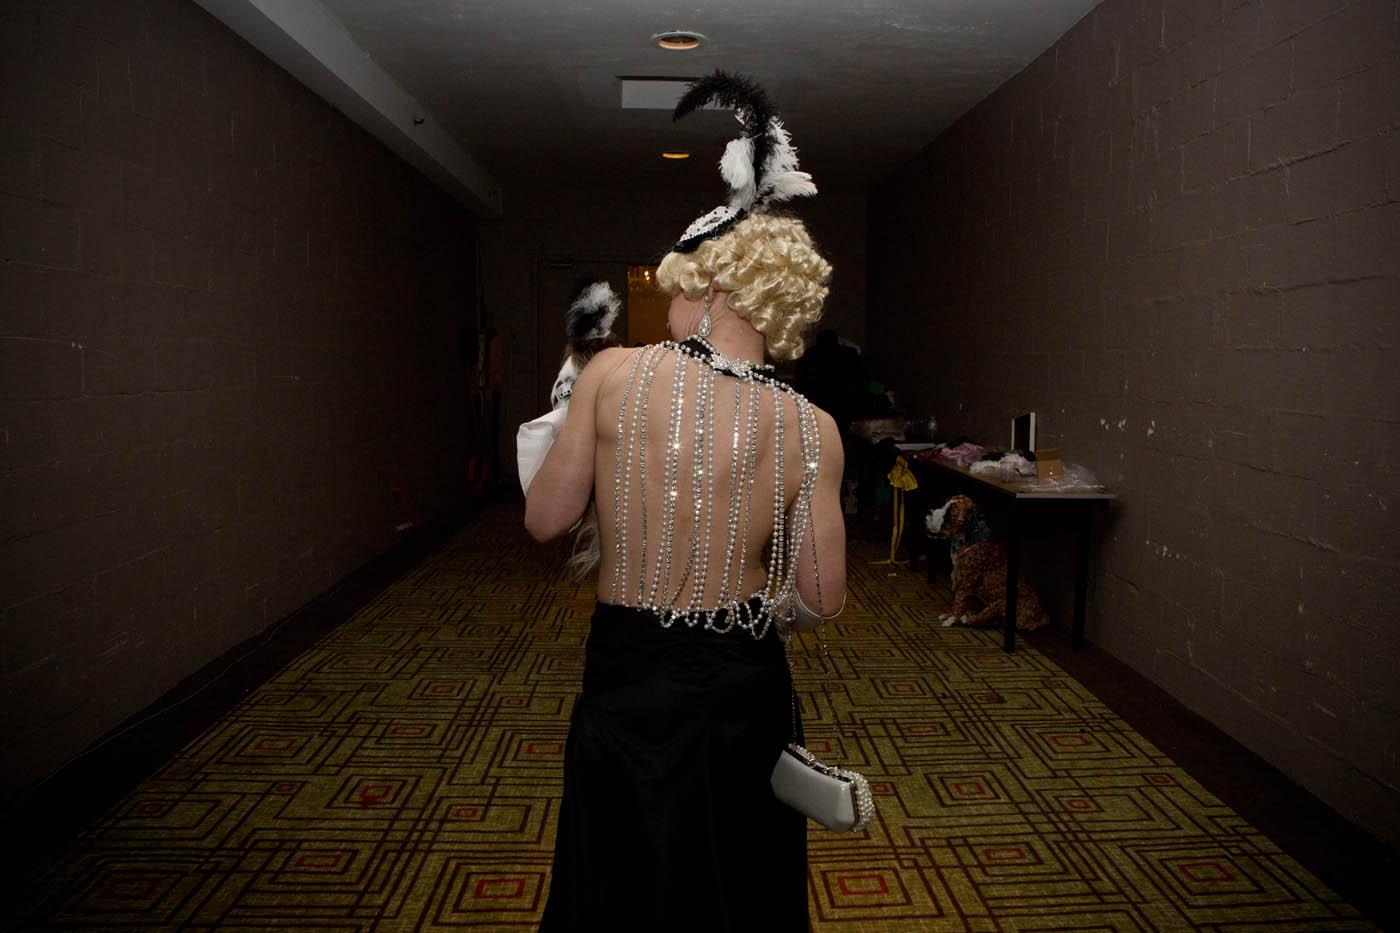 At the Roaring Twenties Pet Fashion